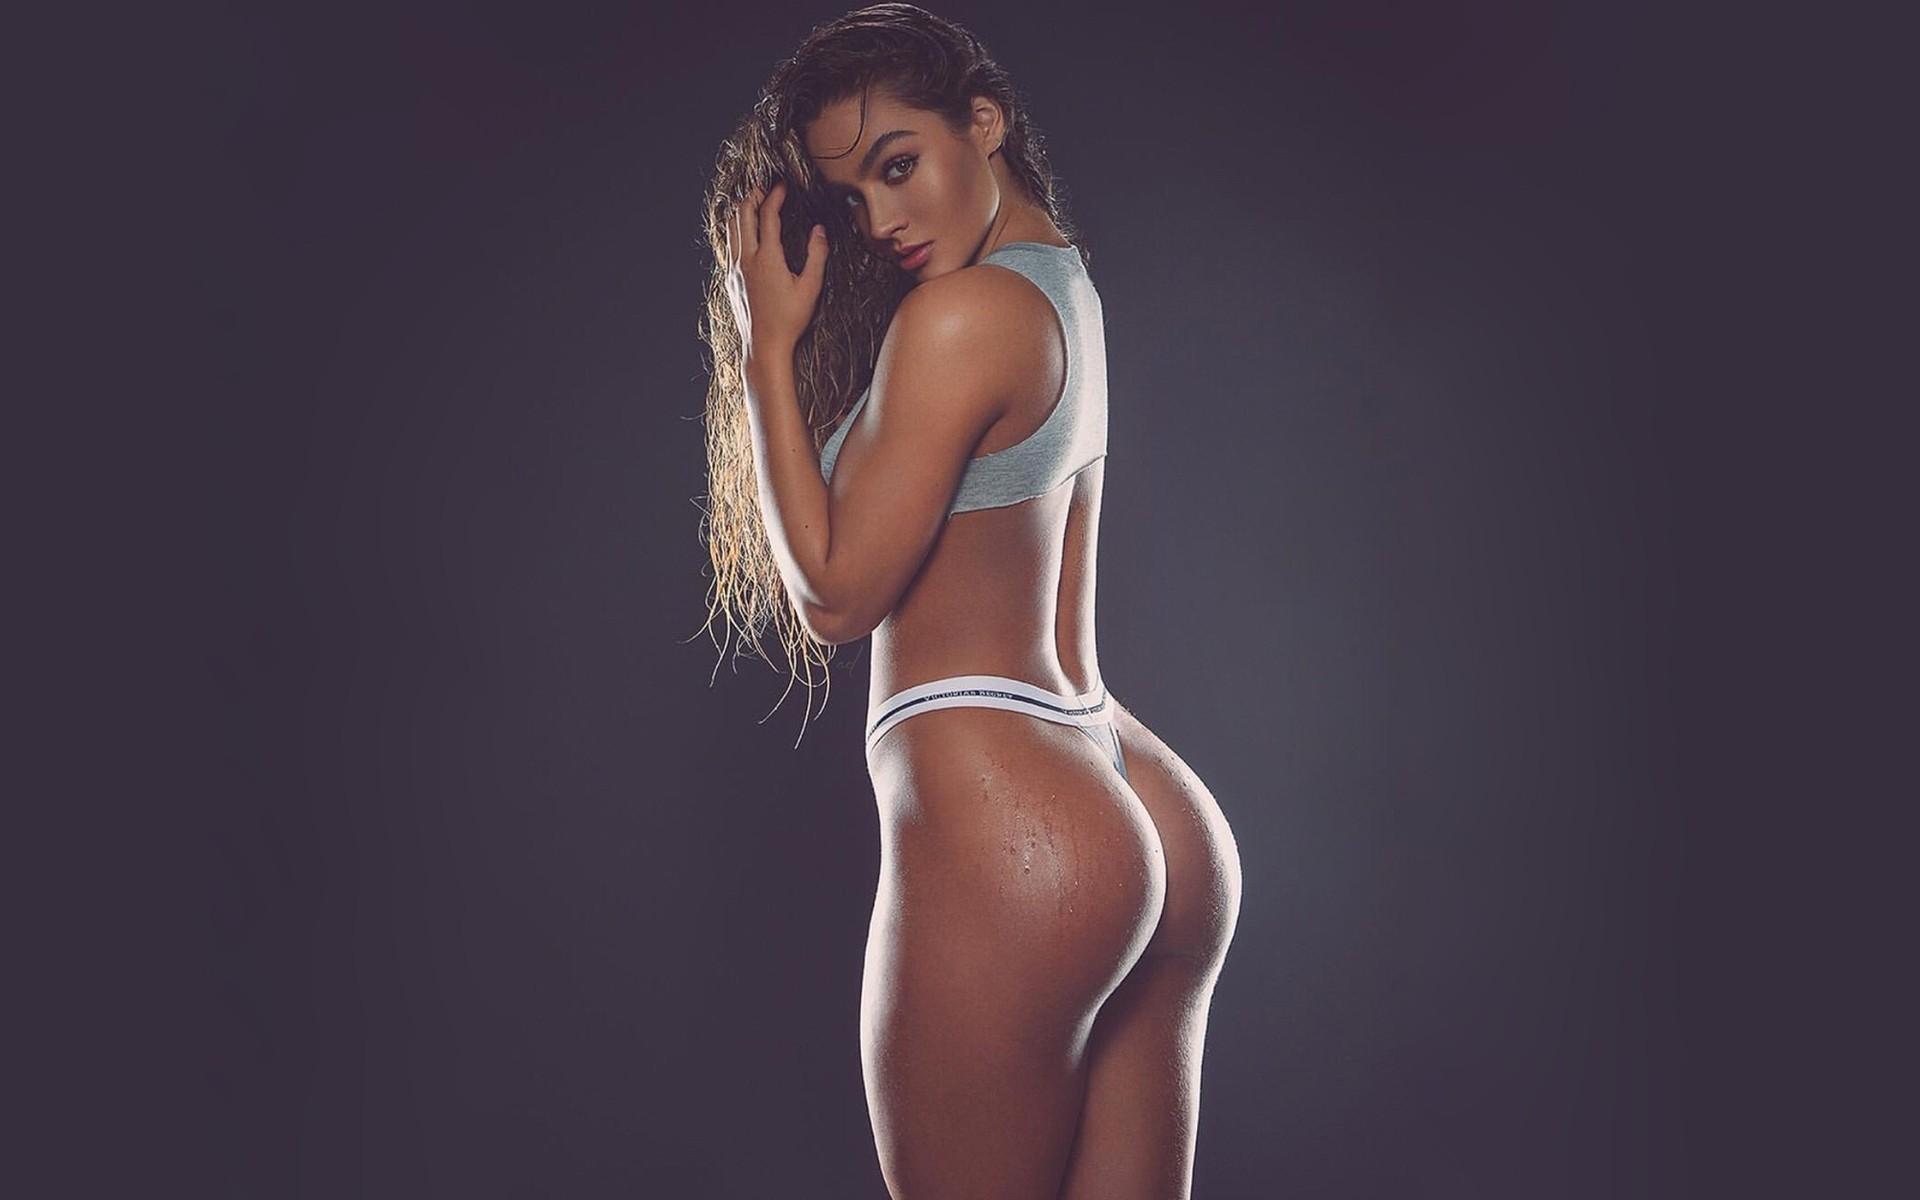 amateur girl athlete naked